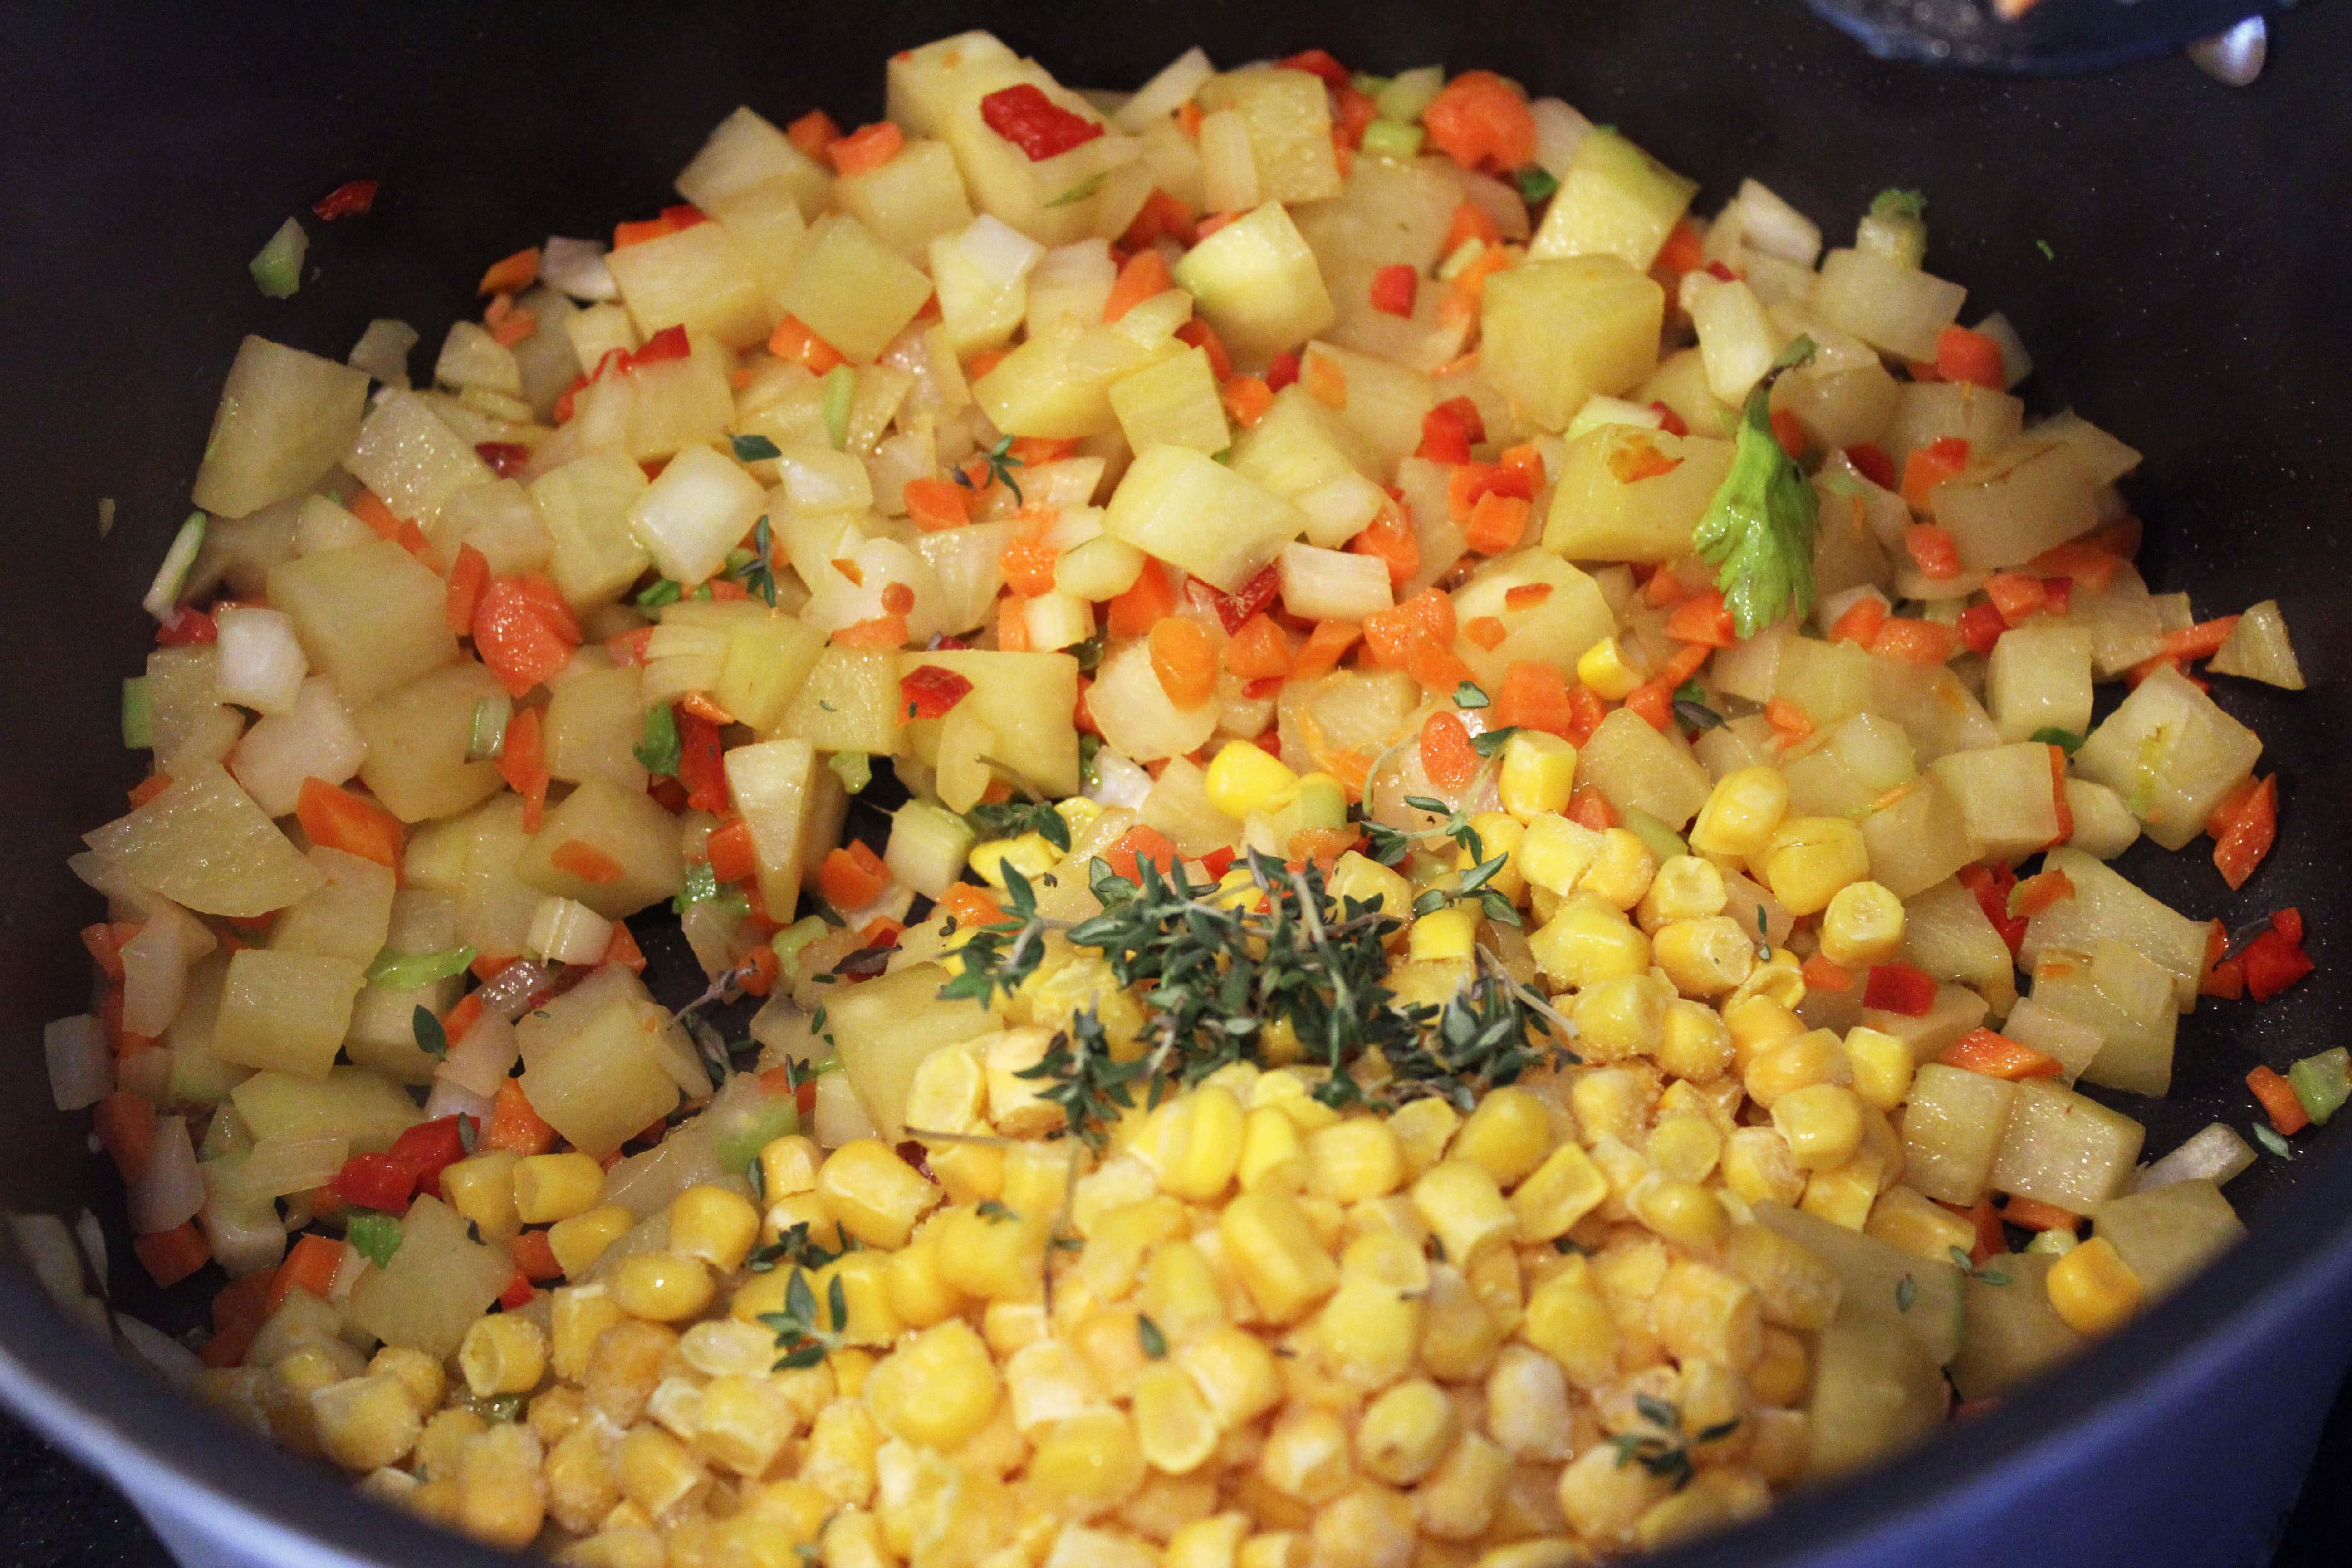 Add corn and thyme to veggies